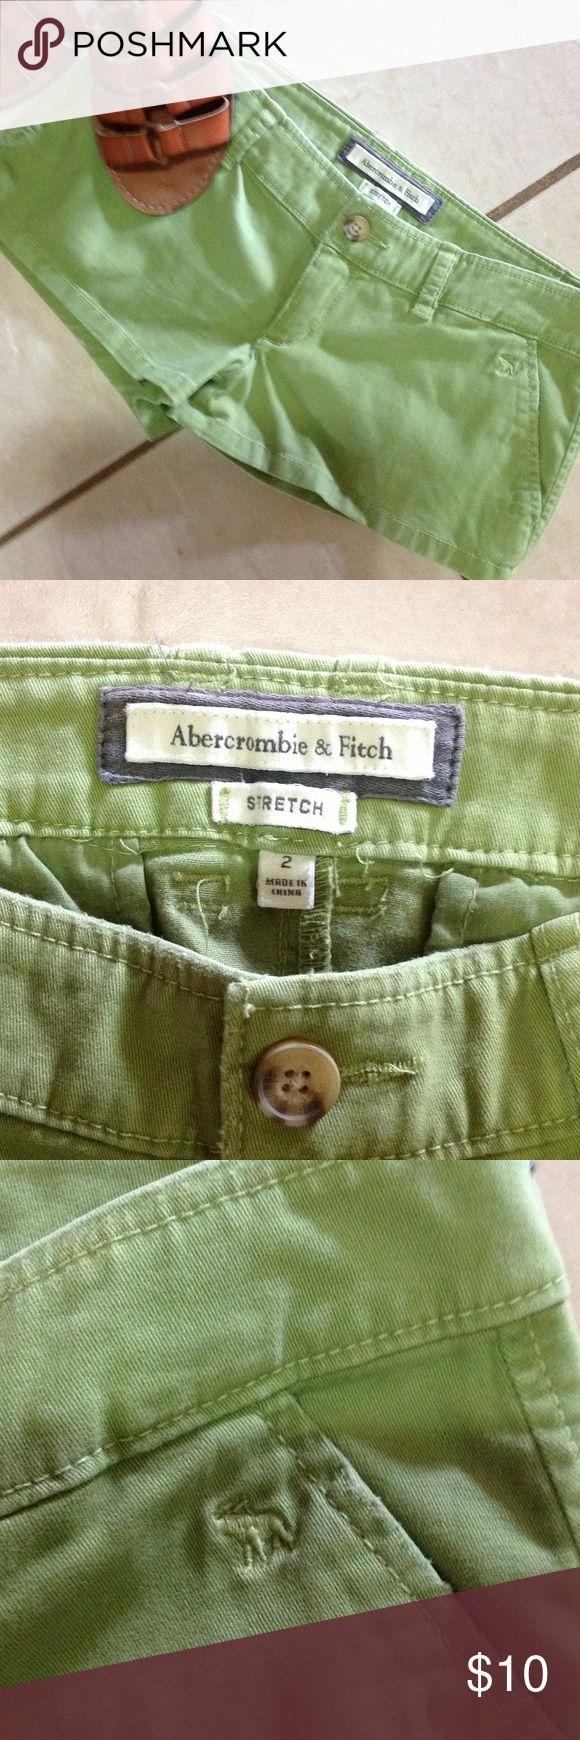 Abercrombie & Fitch shorts. Abercrombie & Fitch shorts in good condition! Abercrombie & Fitch Shorts